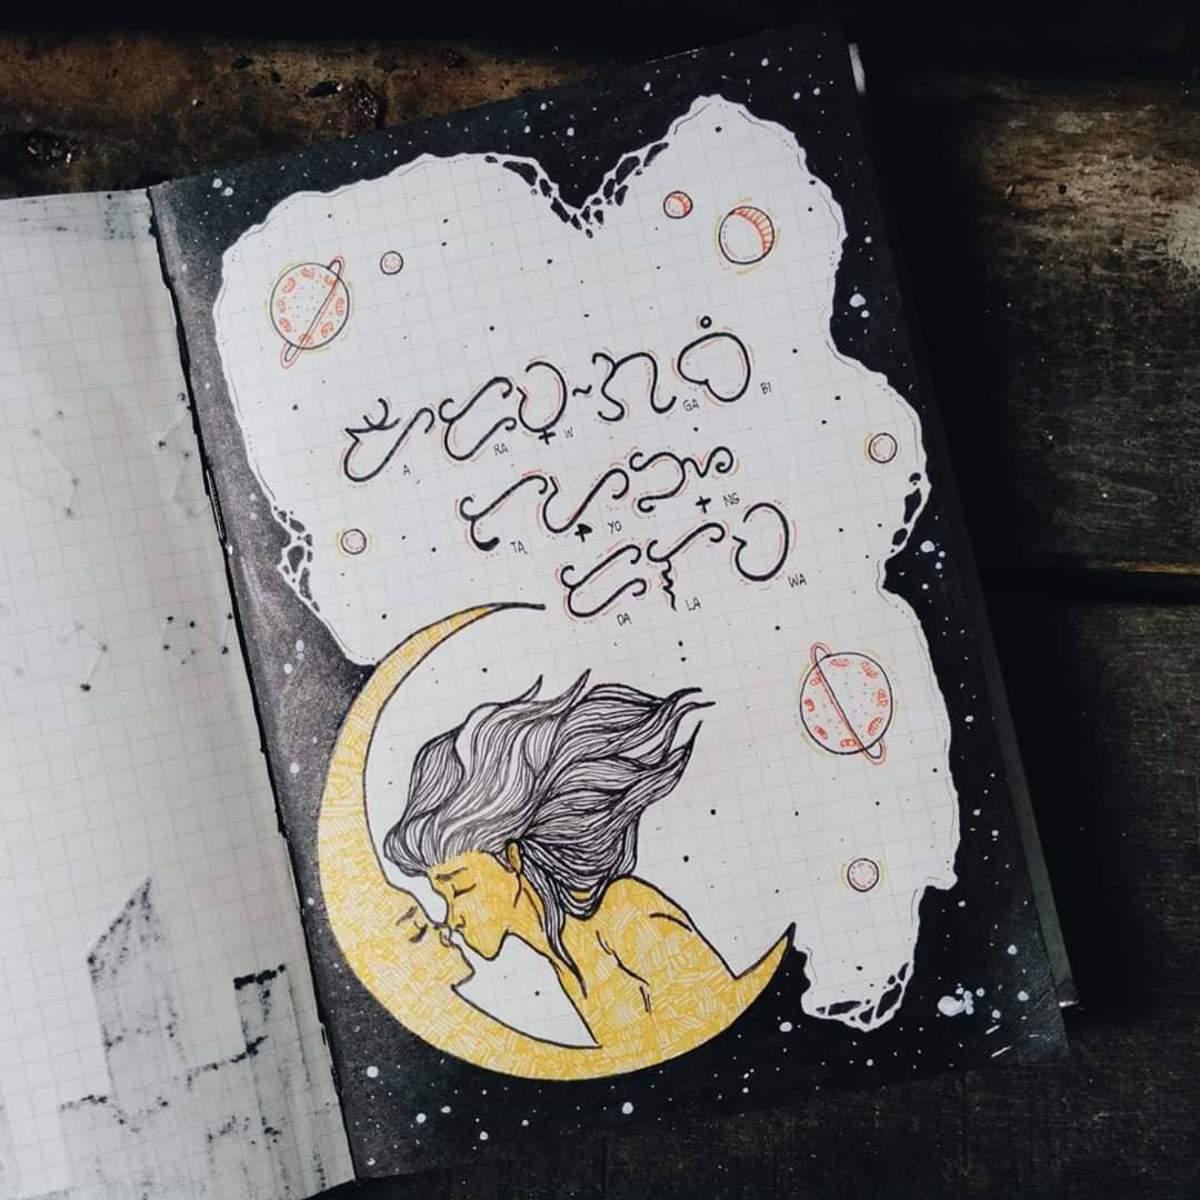 """Araw, gabi. Tayong dalawa."" Art and calligraphy by @siningnihiraya via Instagram"